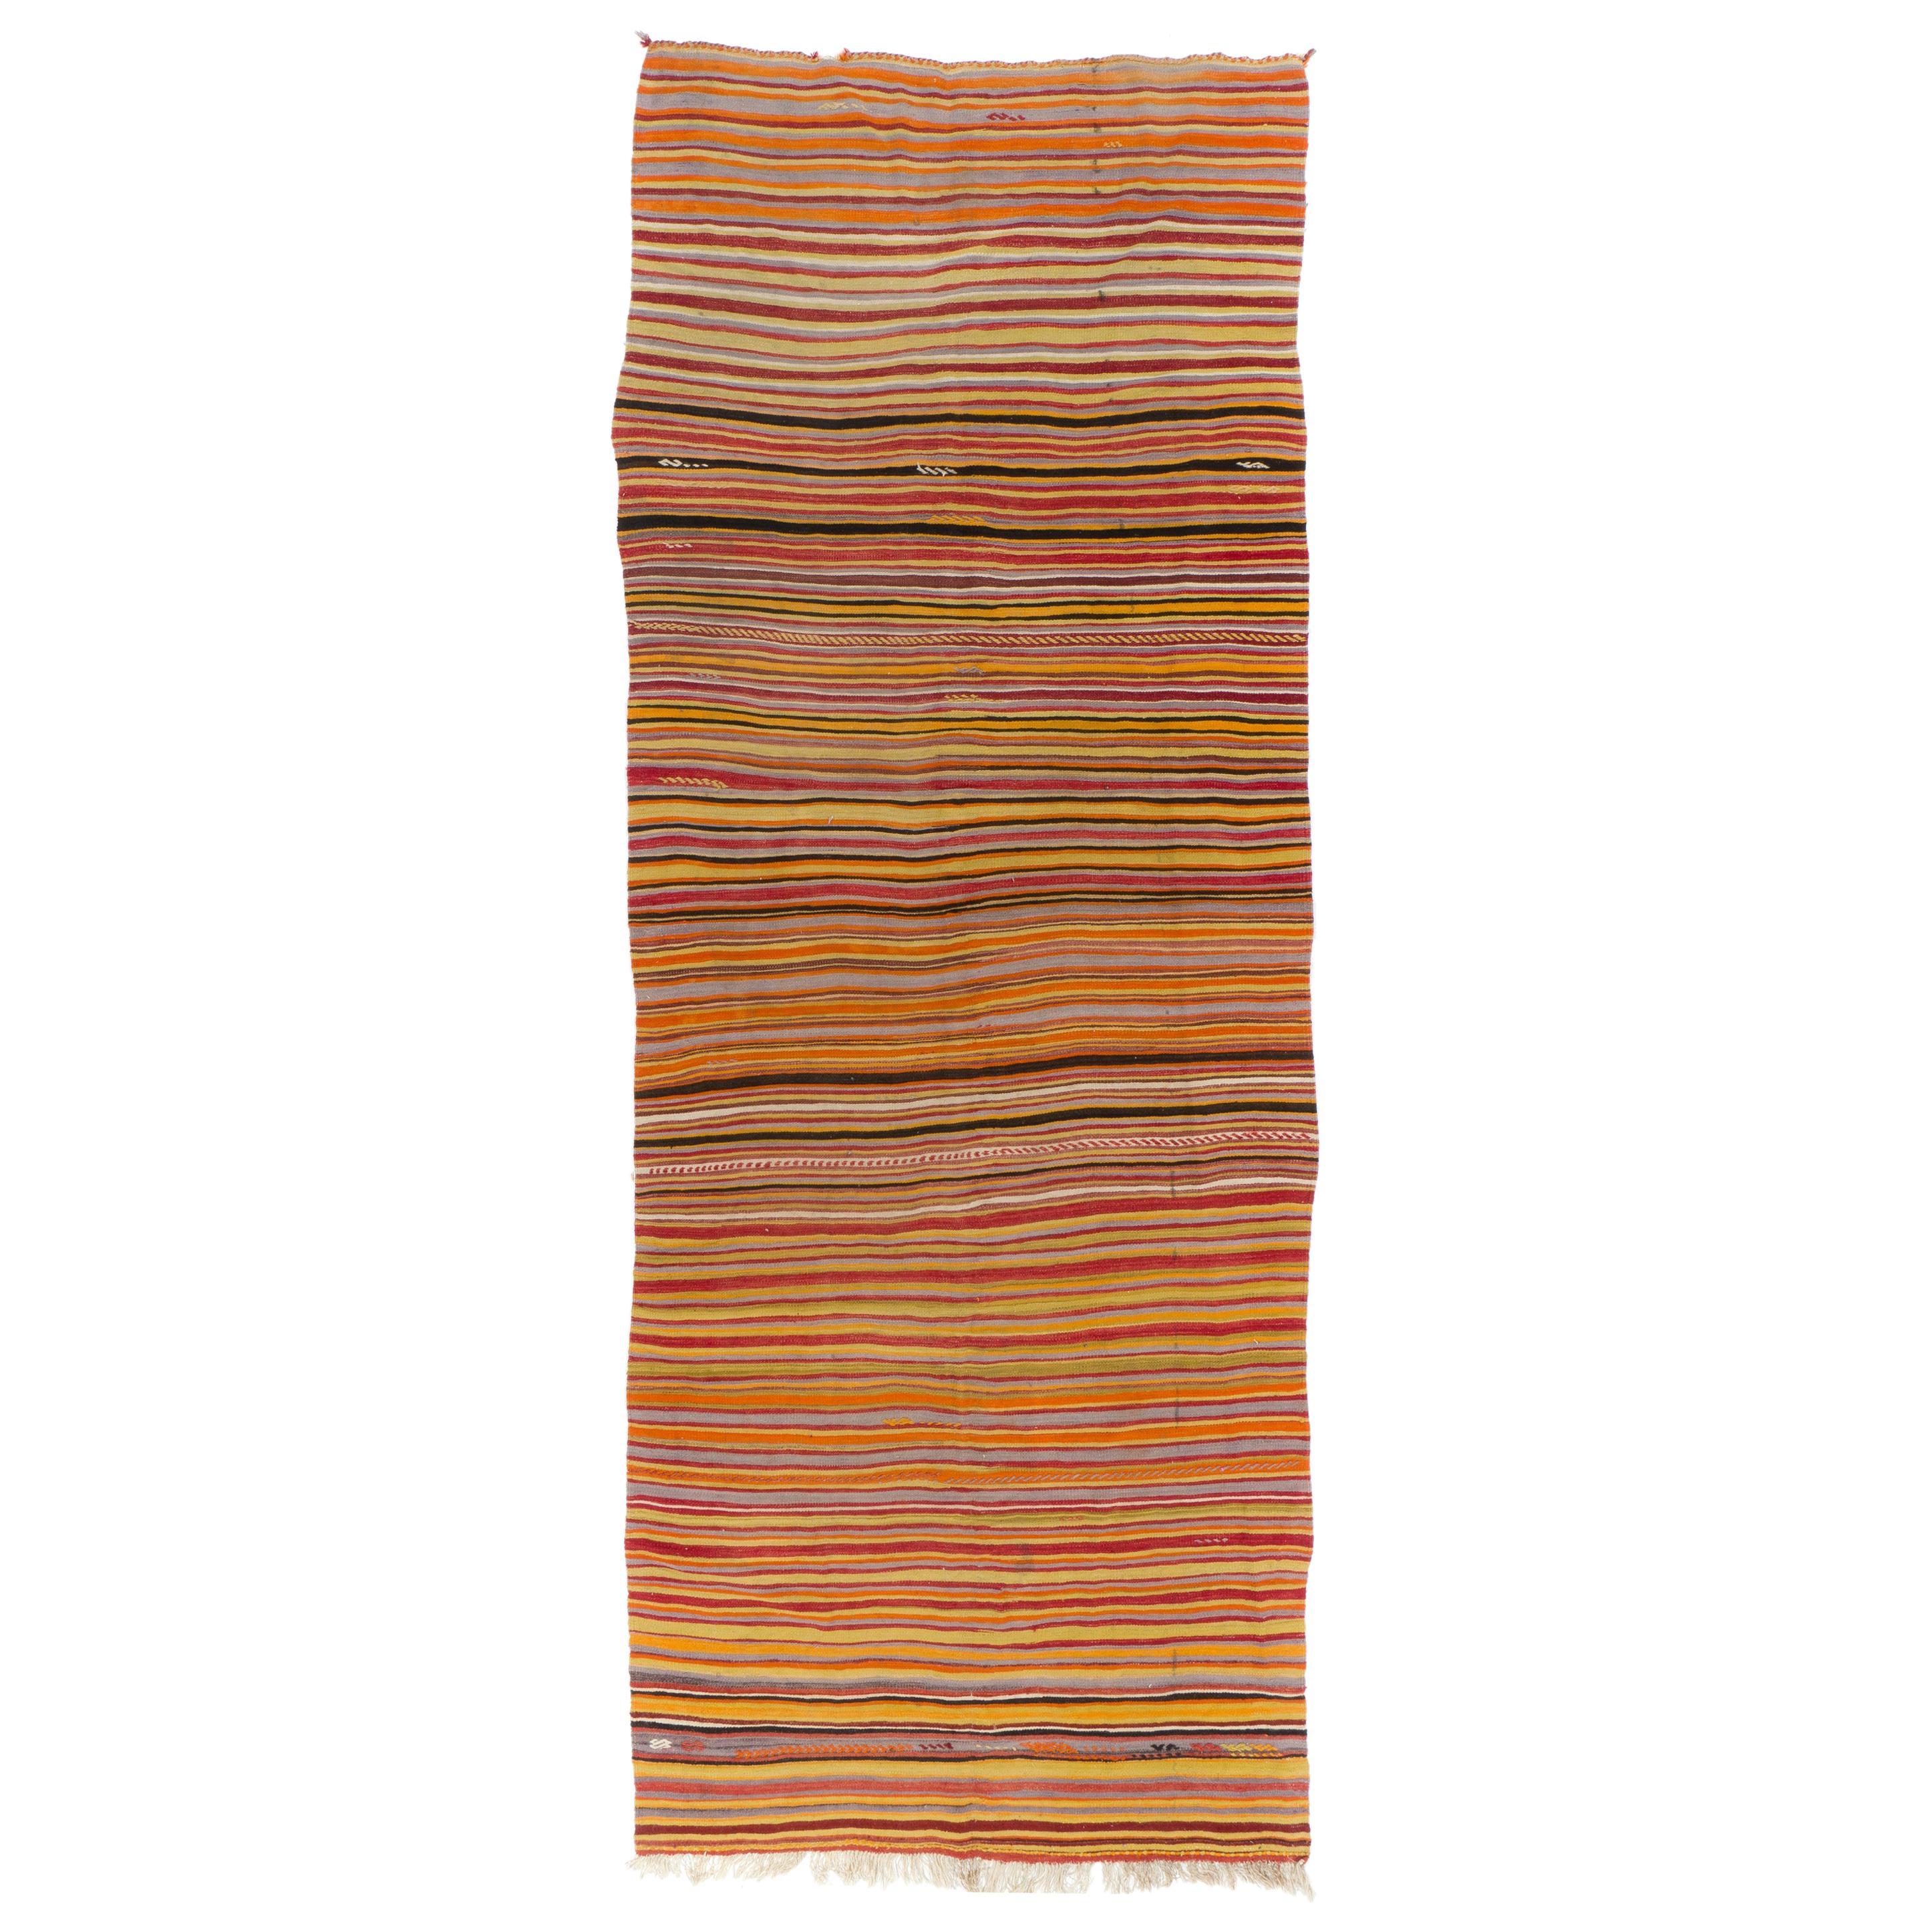 Banded Handwoven Vintage Turkish Runner Kilim 'Flat-Weave', All Wool